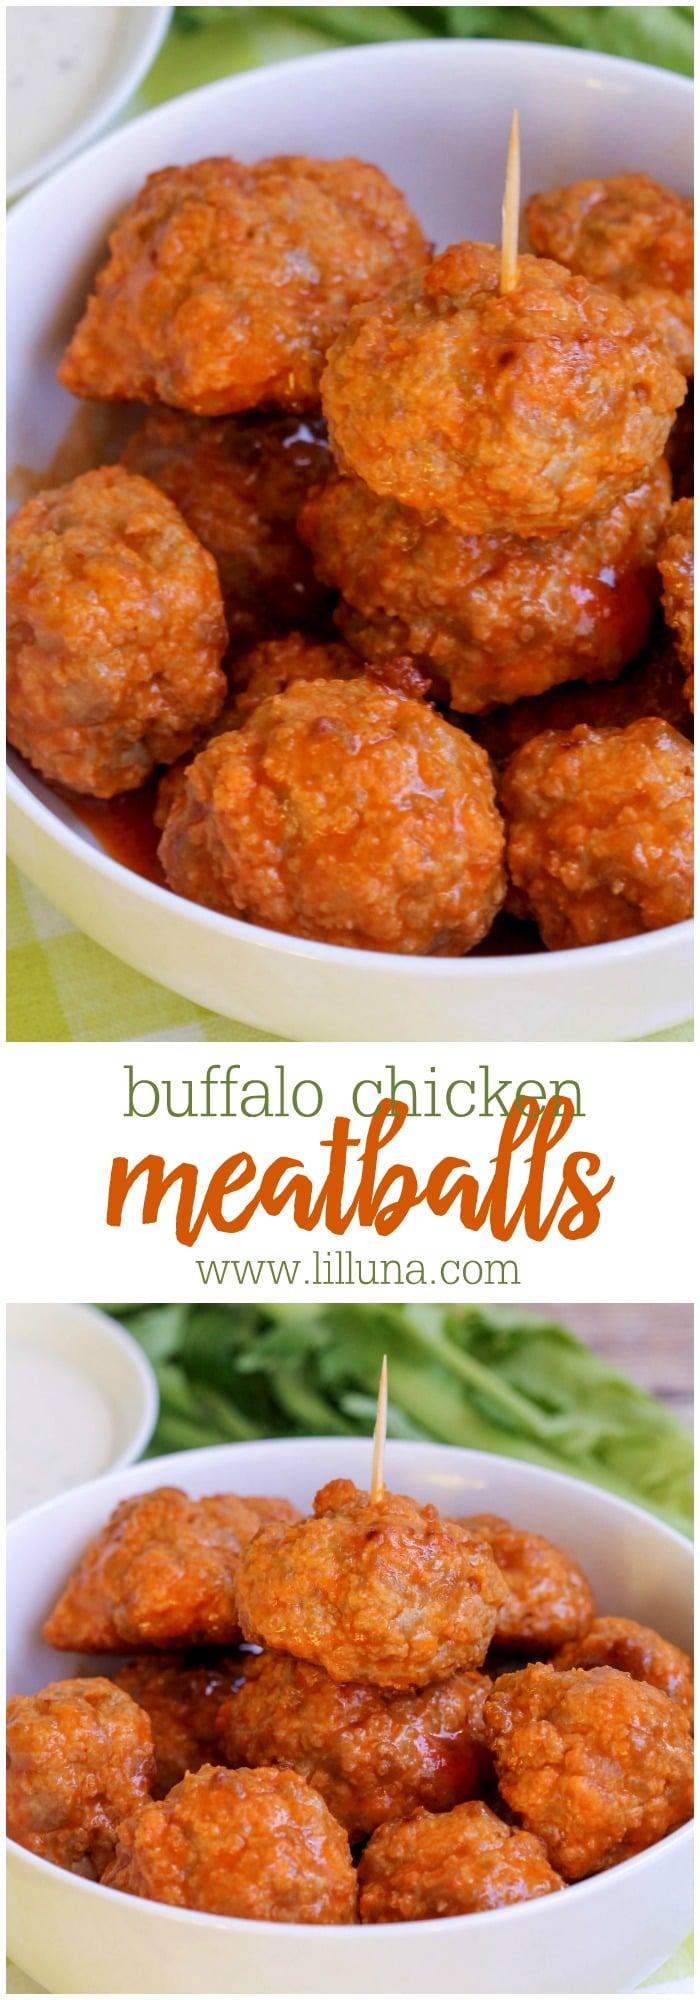 buffalo-chicken-meatballs-collage